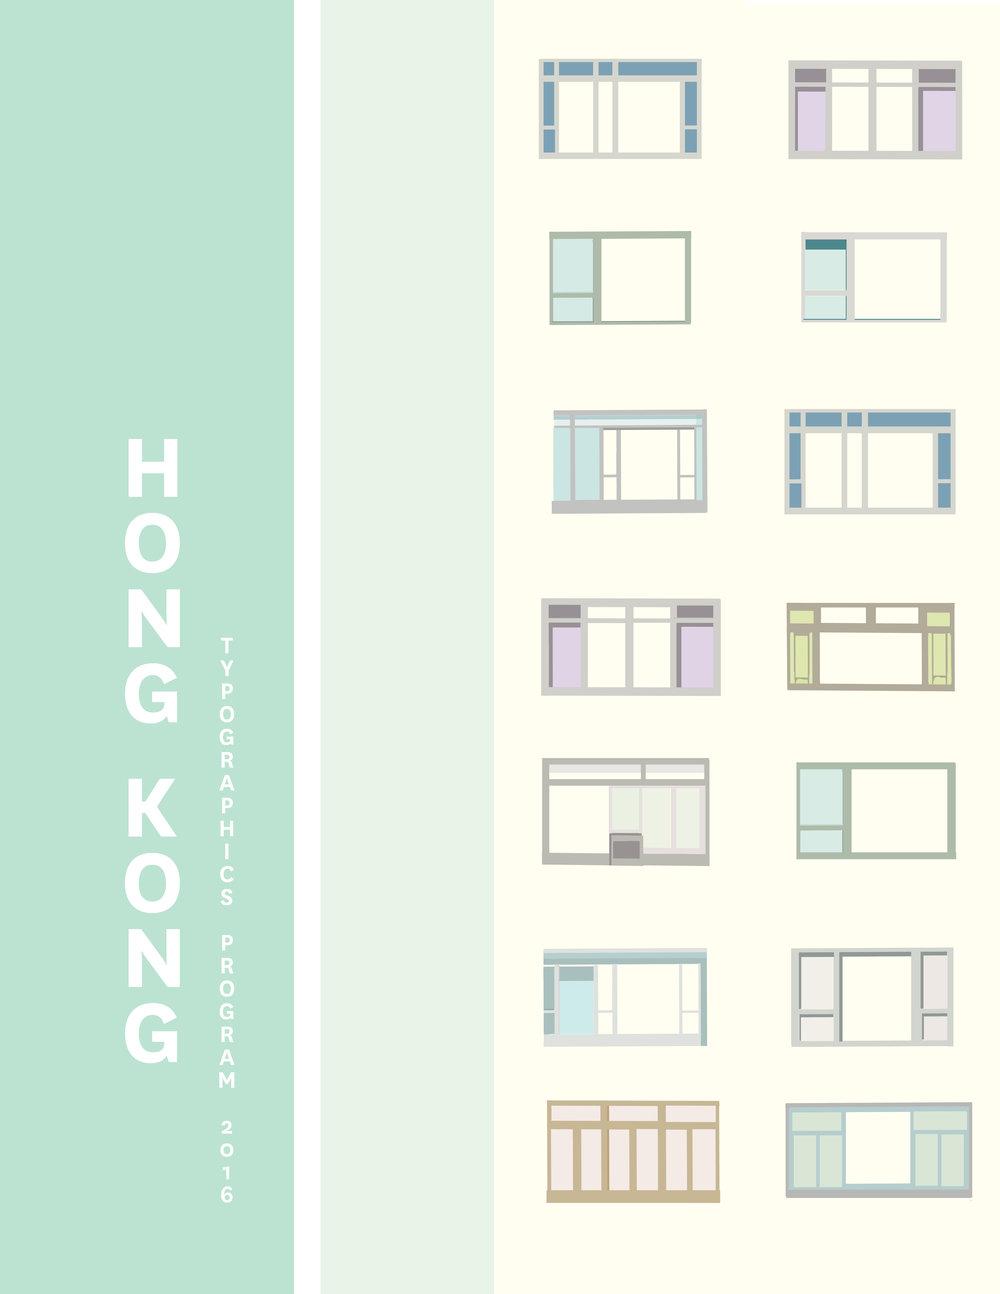 Program Schedule (Cover)